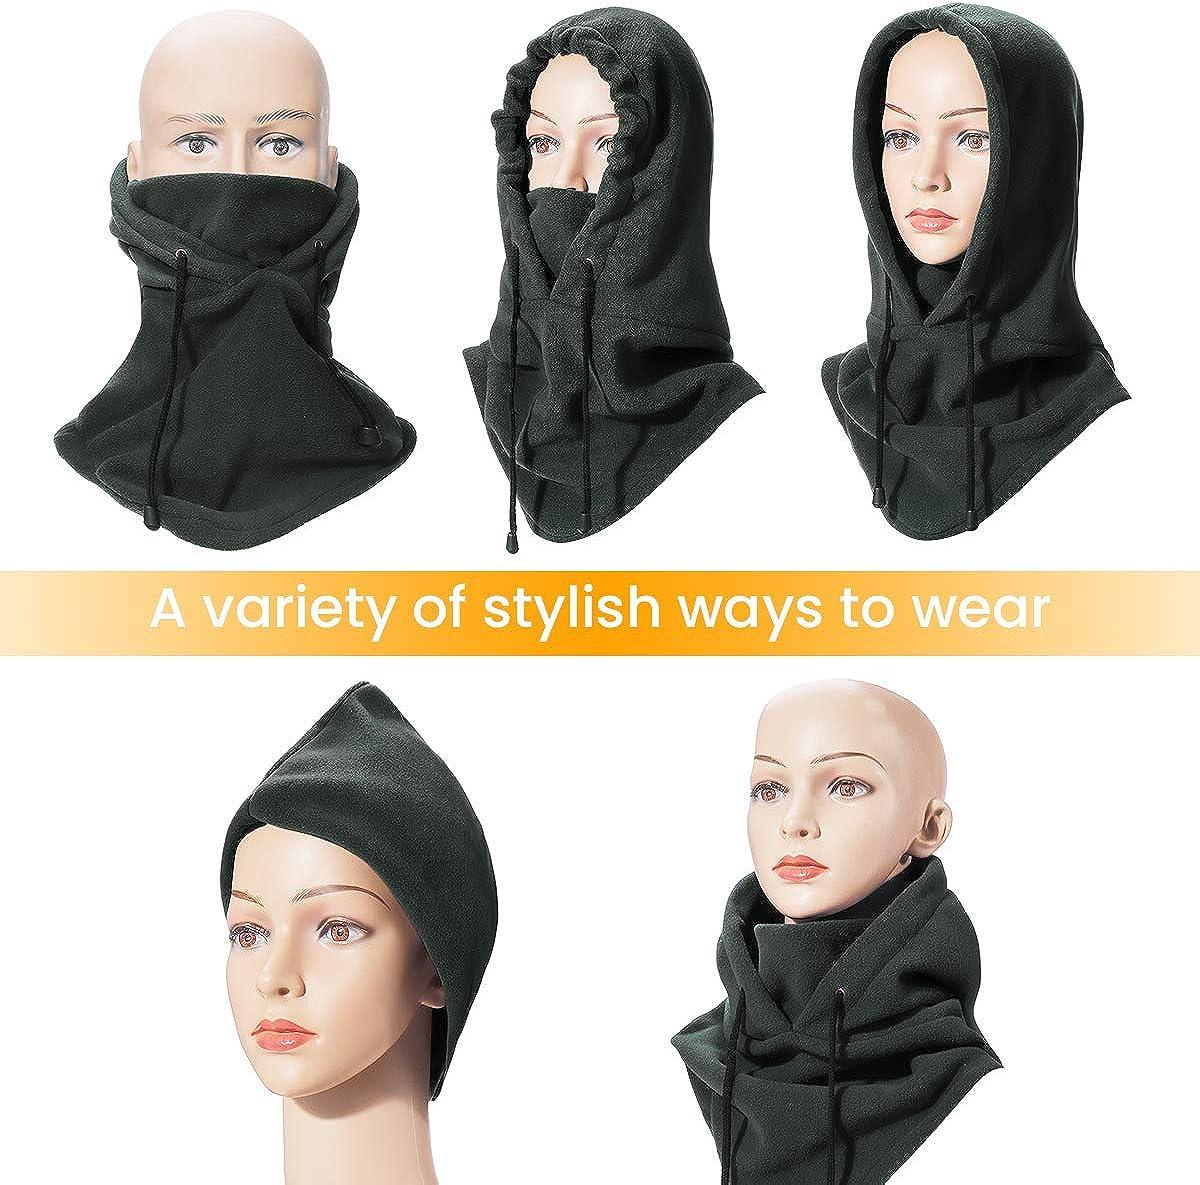 MOHOO Ski Mask Fleece Balaclava Adjustable Windproof Winter Half Face Mask Lengthened Warm Ski Balaclava for Men Women, Light Black